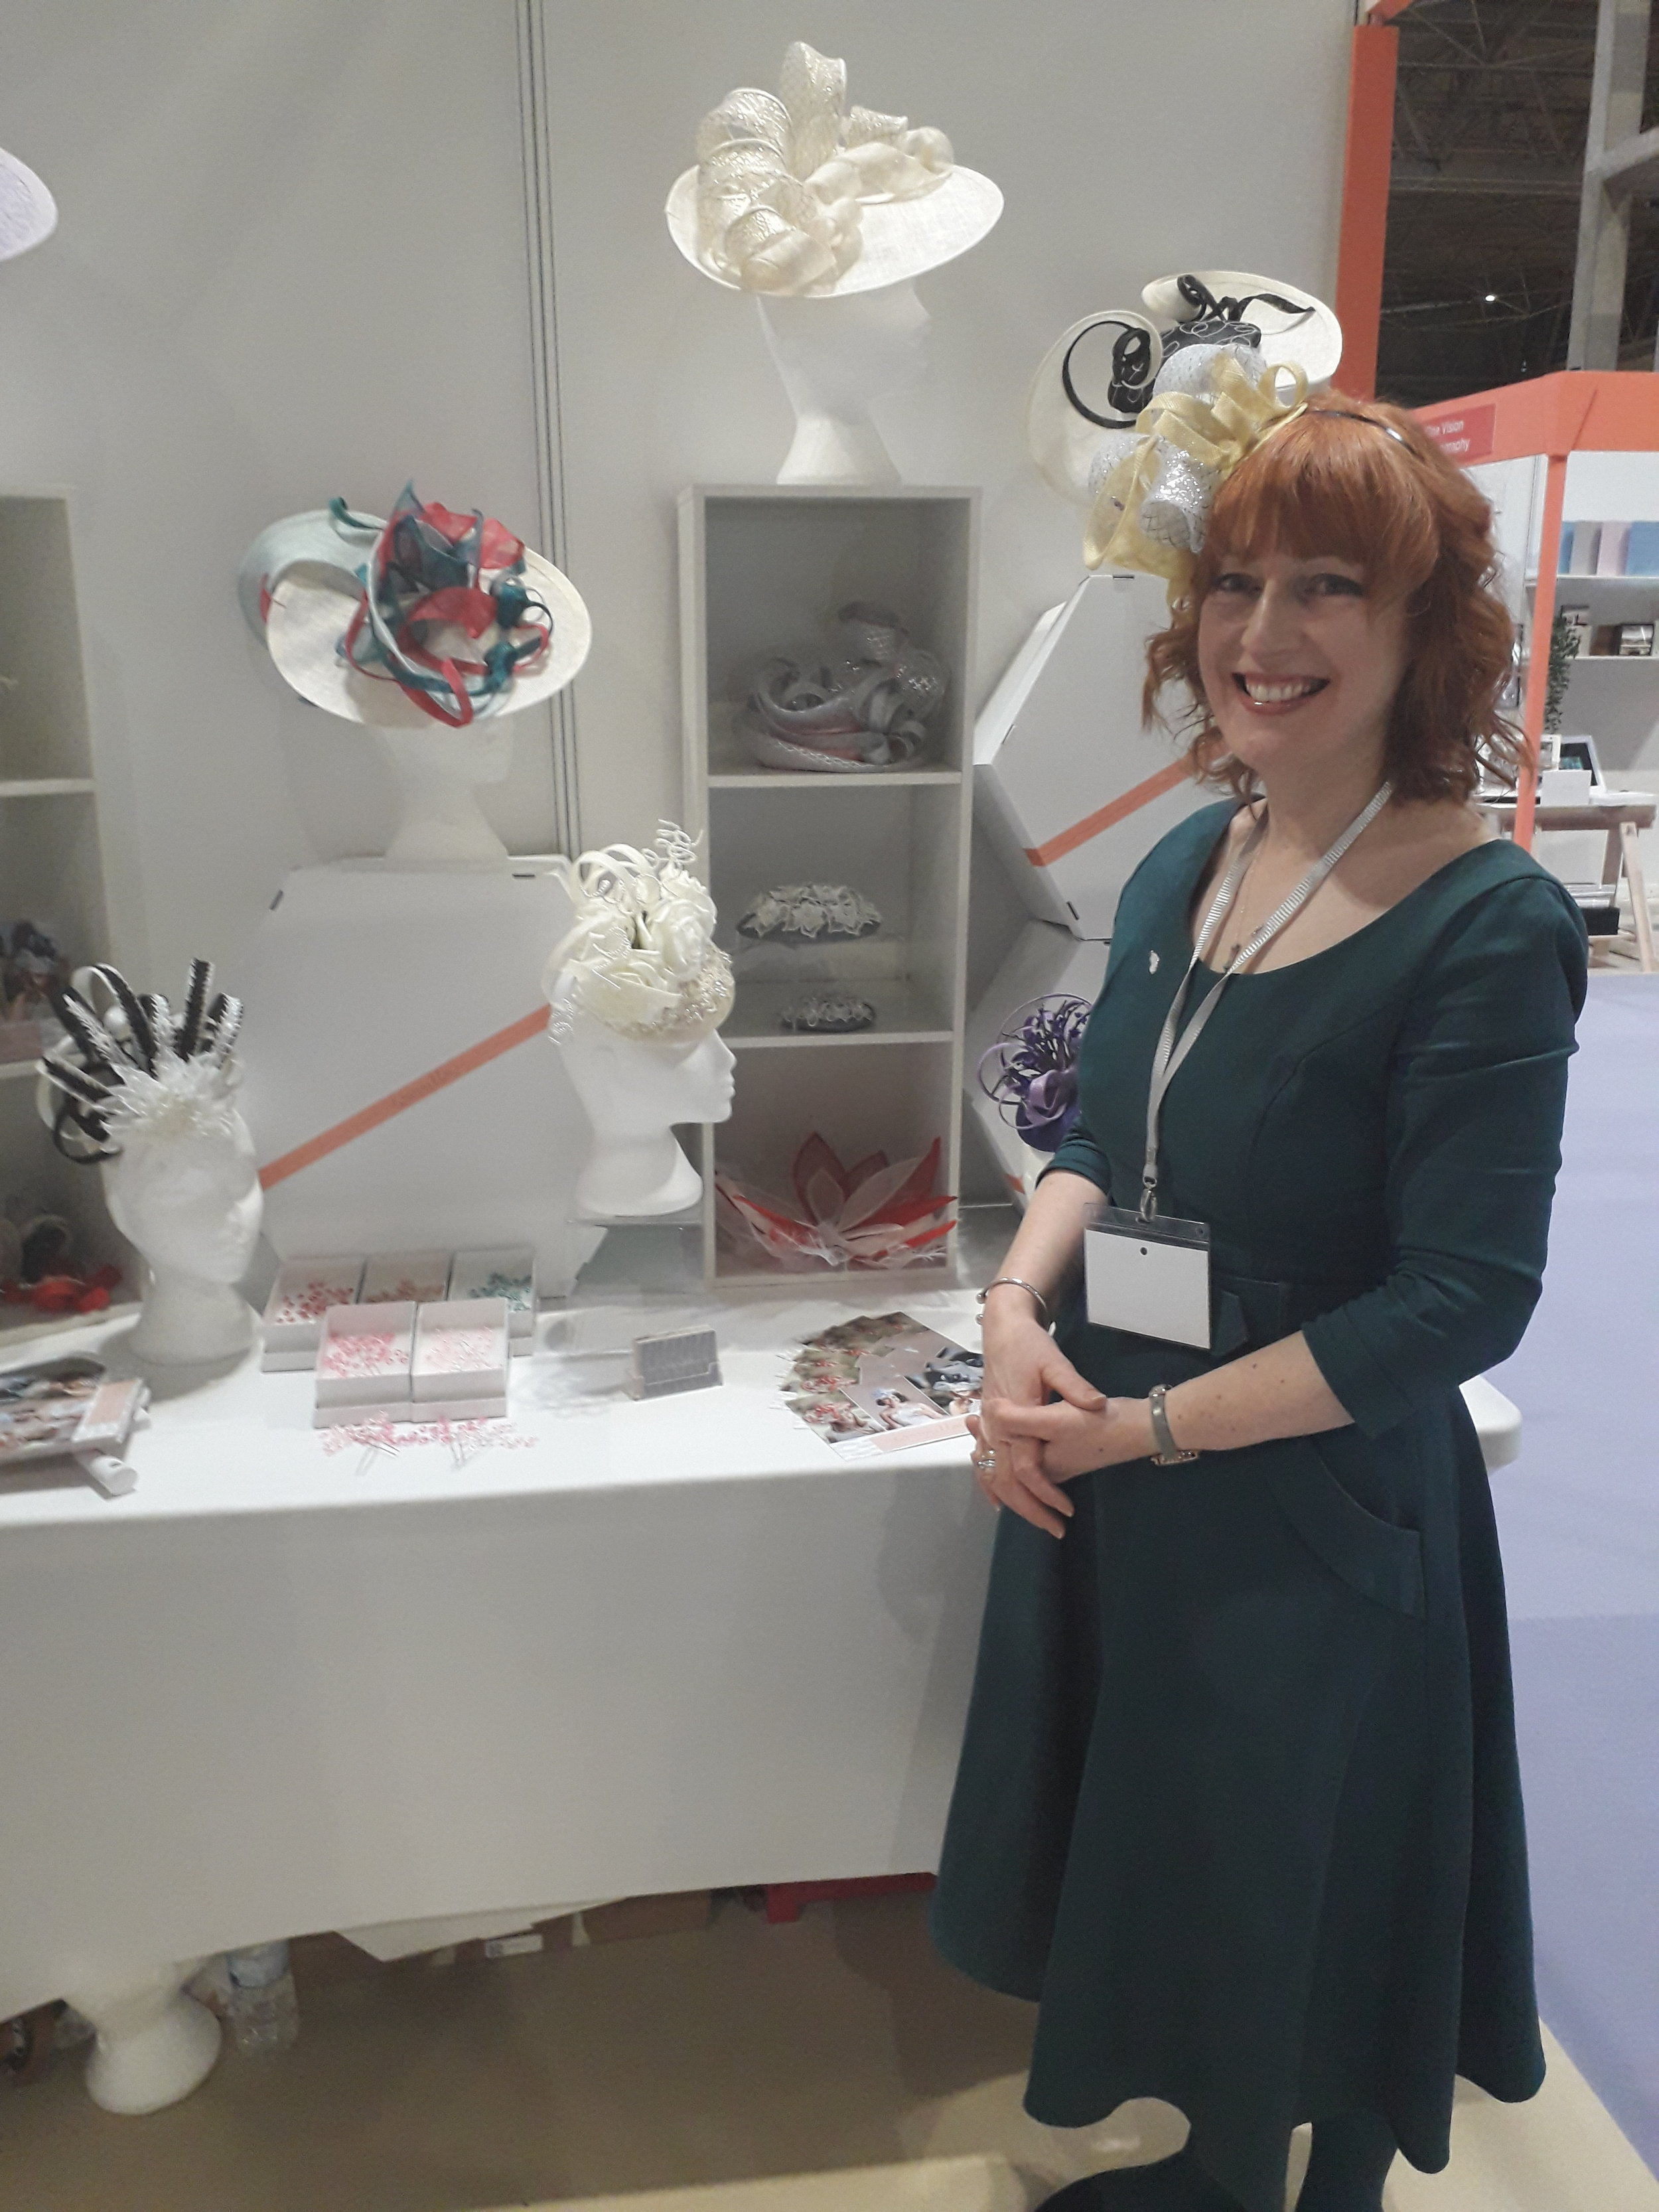 wedding fair workshops demonstrations and displays